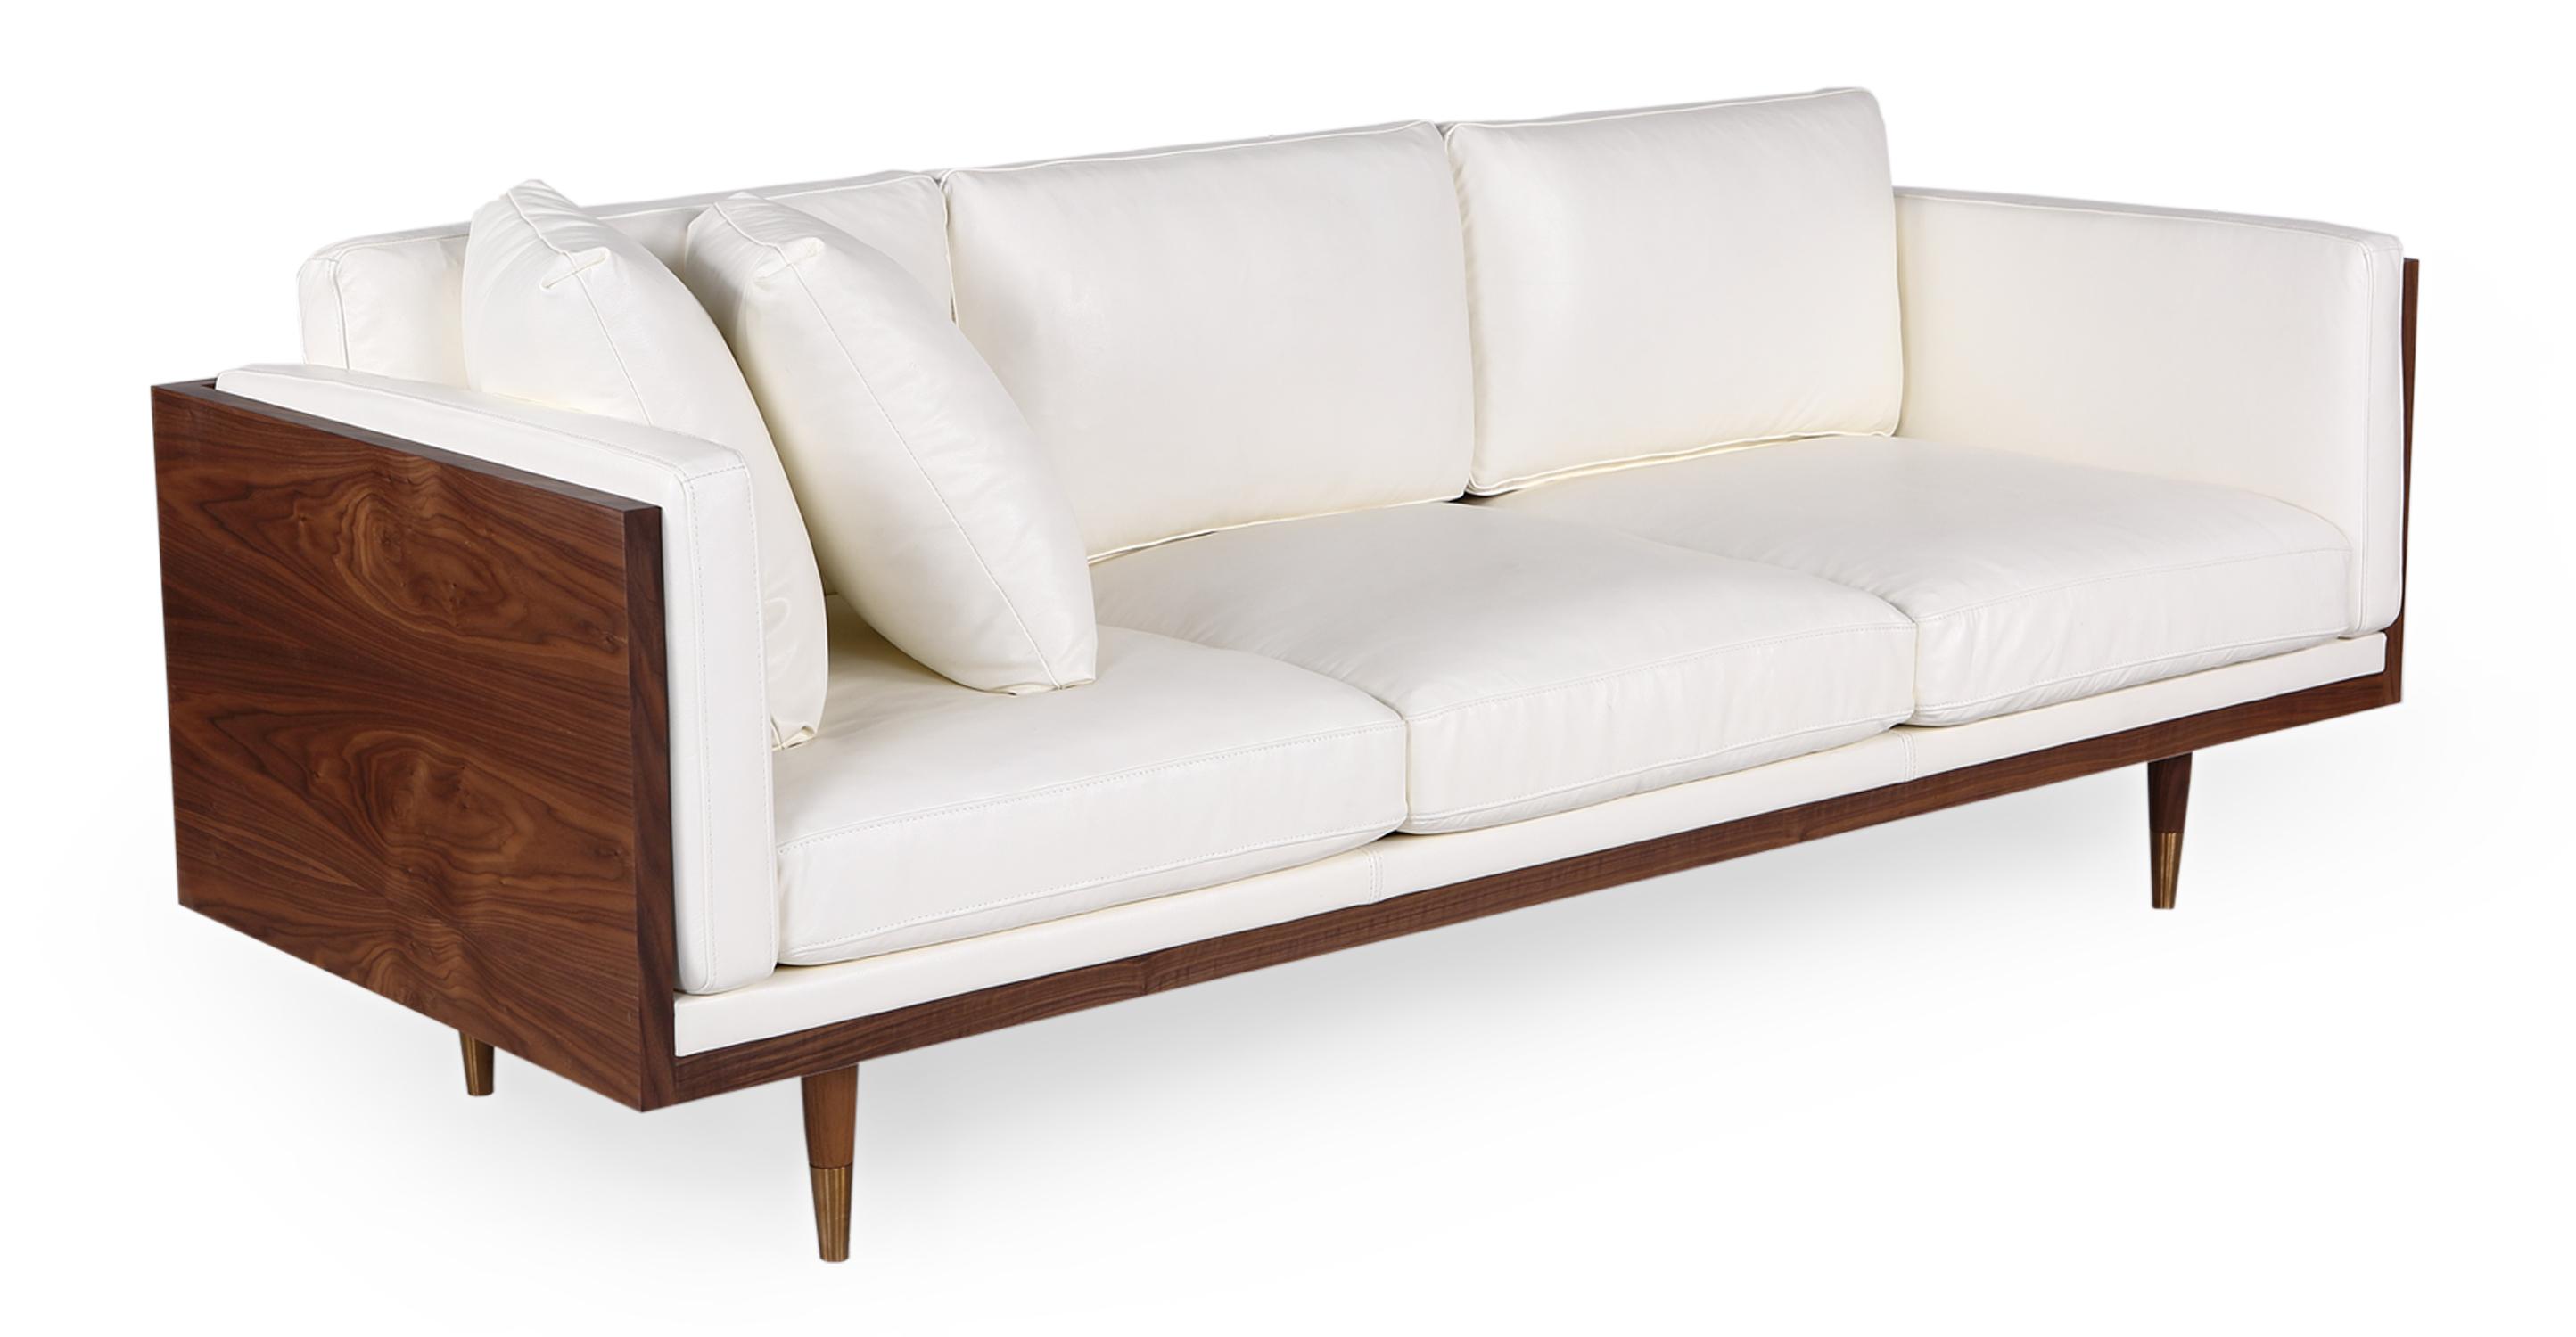 "Woodrow Lush 87"" Leather Sofa, Walnut/White Aniline"